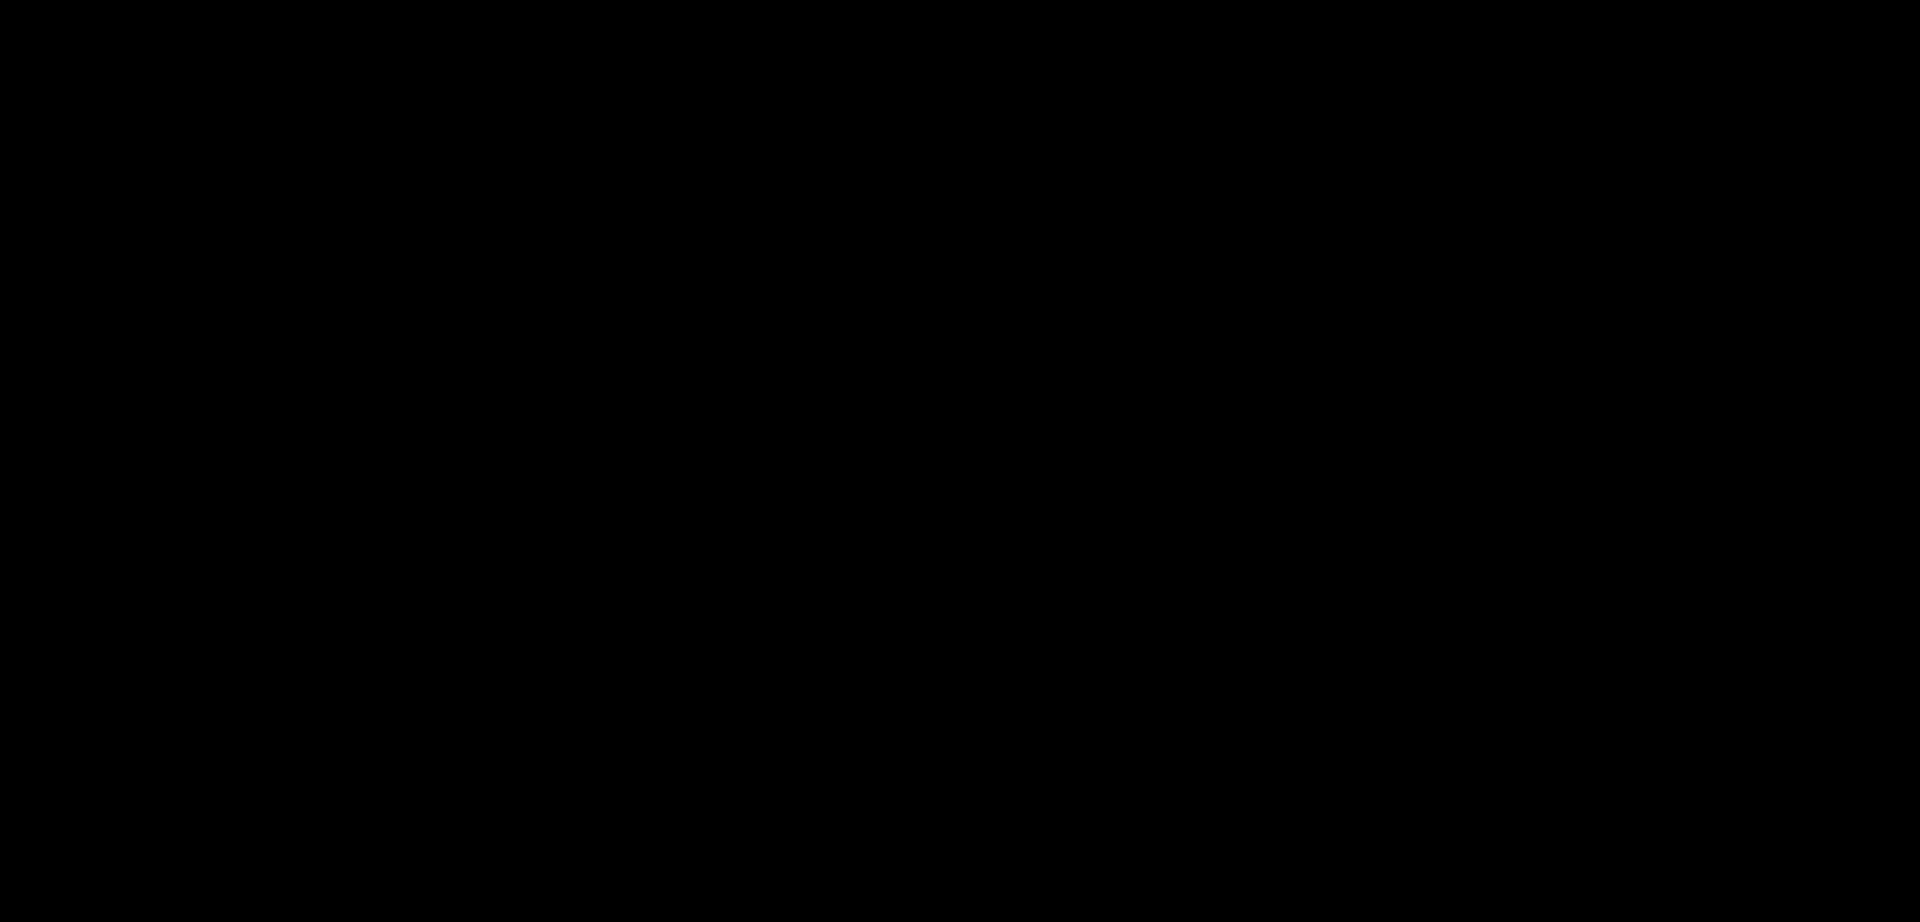 https://secureservercdn.net/198.71.233.179/mjf.381.myftpupload.com/wp-content/uploads/2021/07/UnderArmour-Logo-wide.png